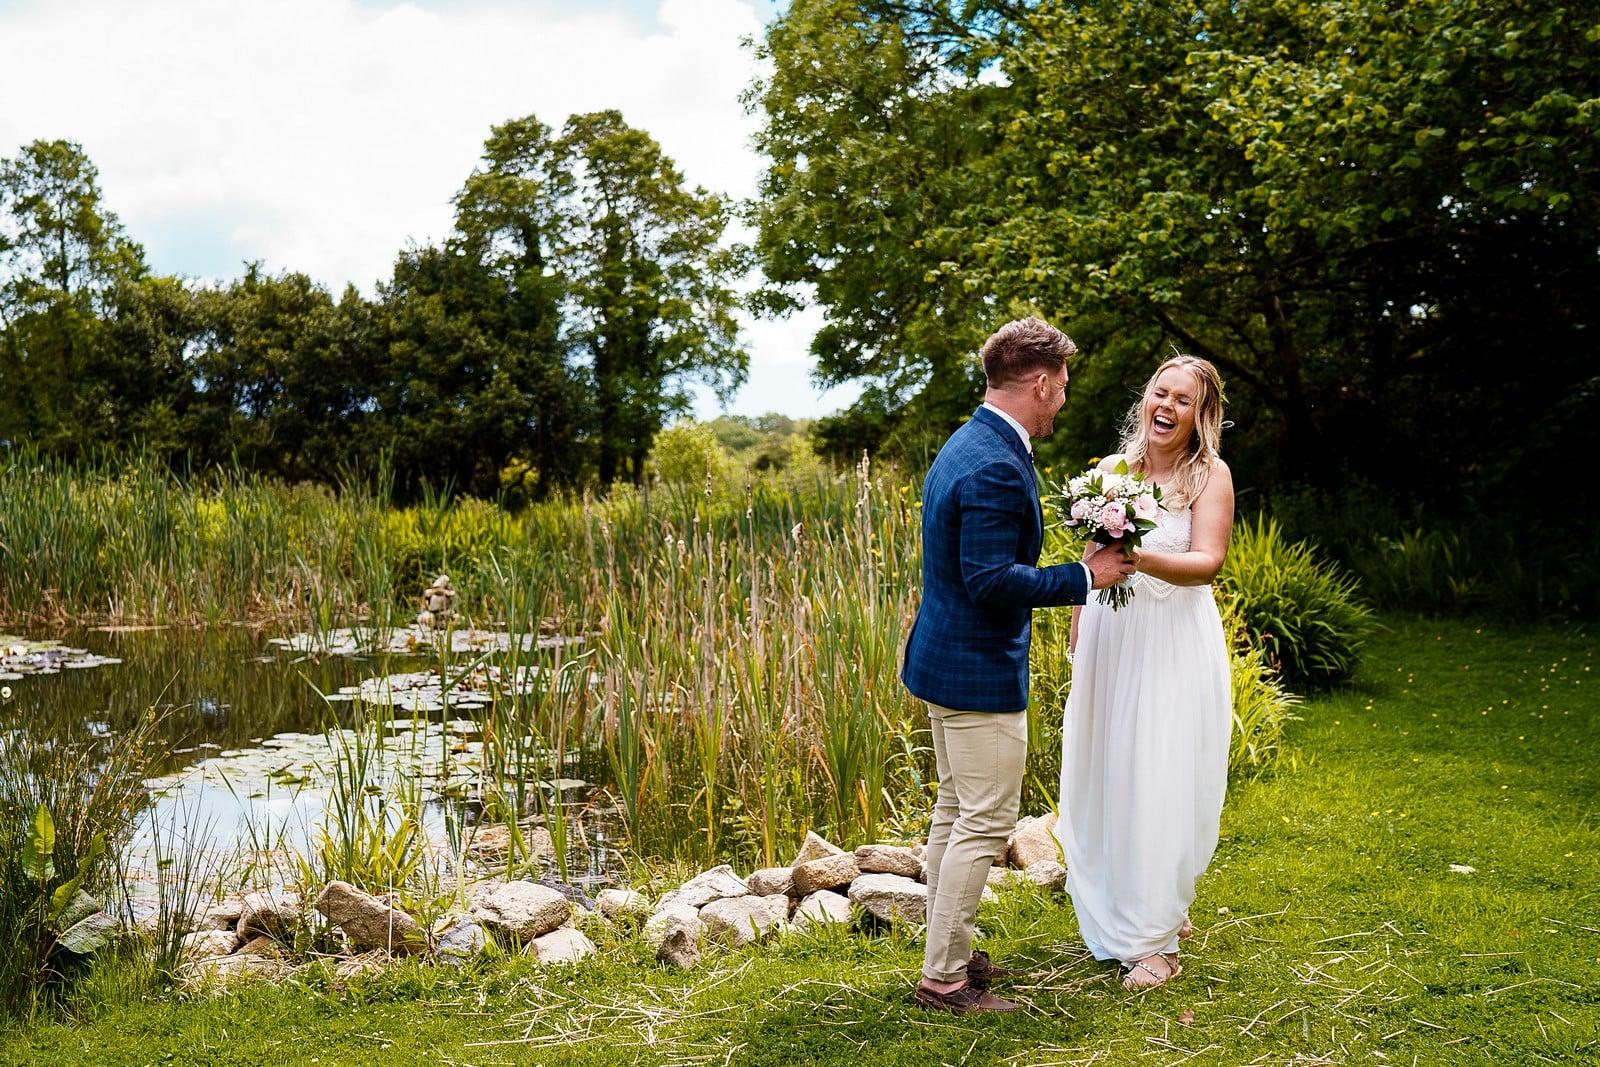 best of 2019 - wedding at Knightor winery 017